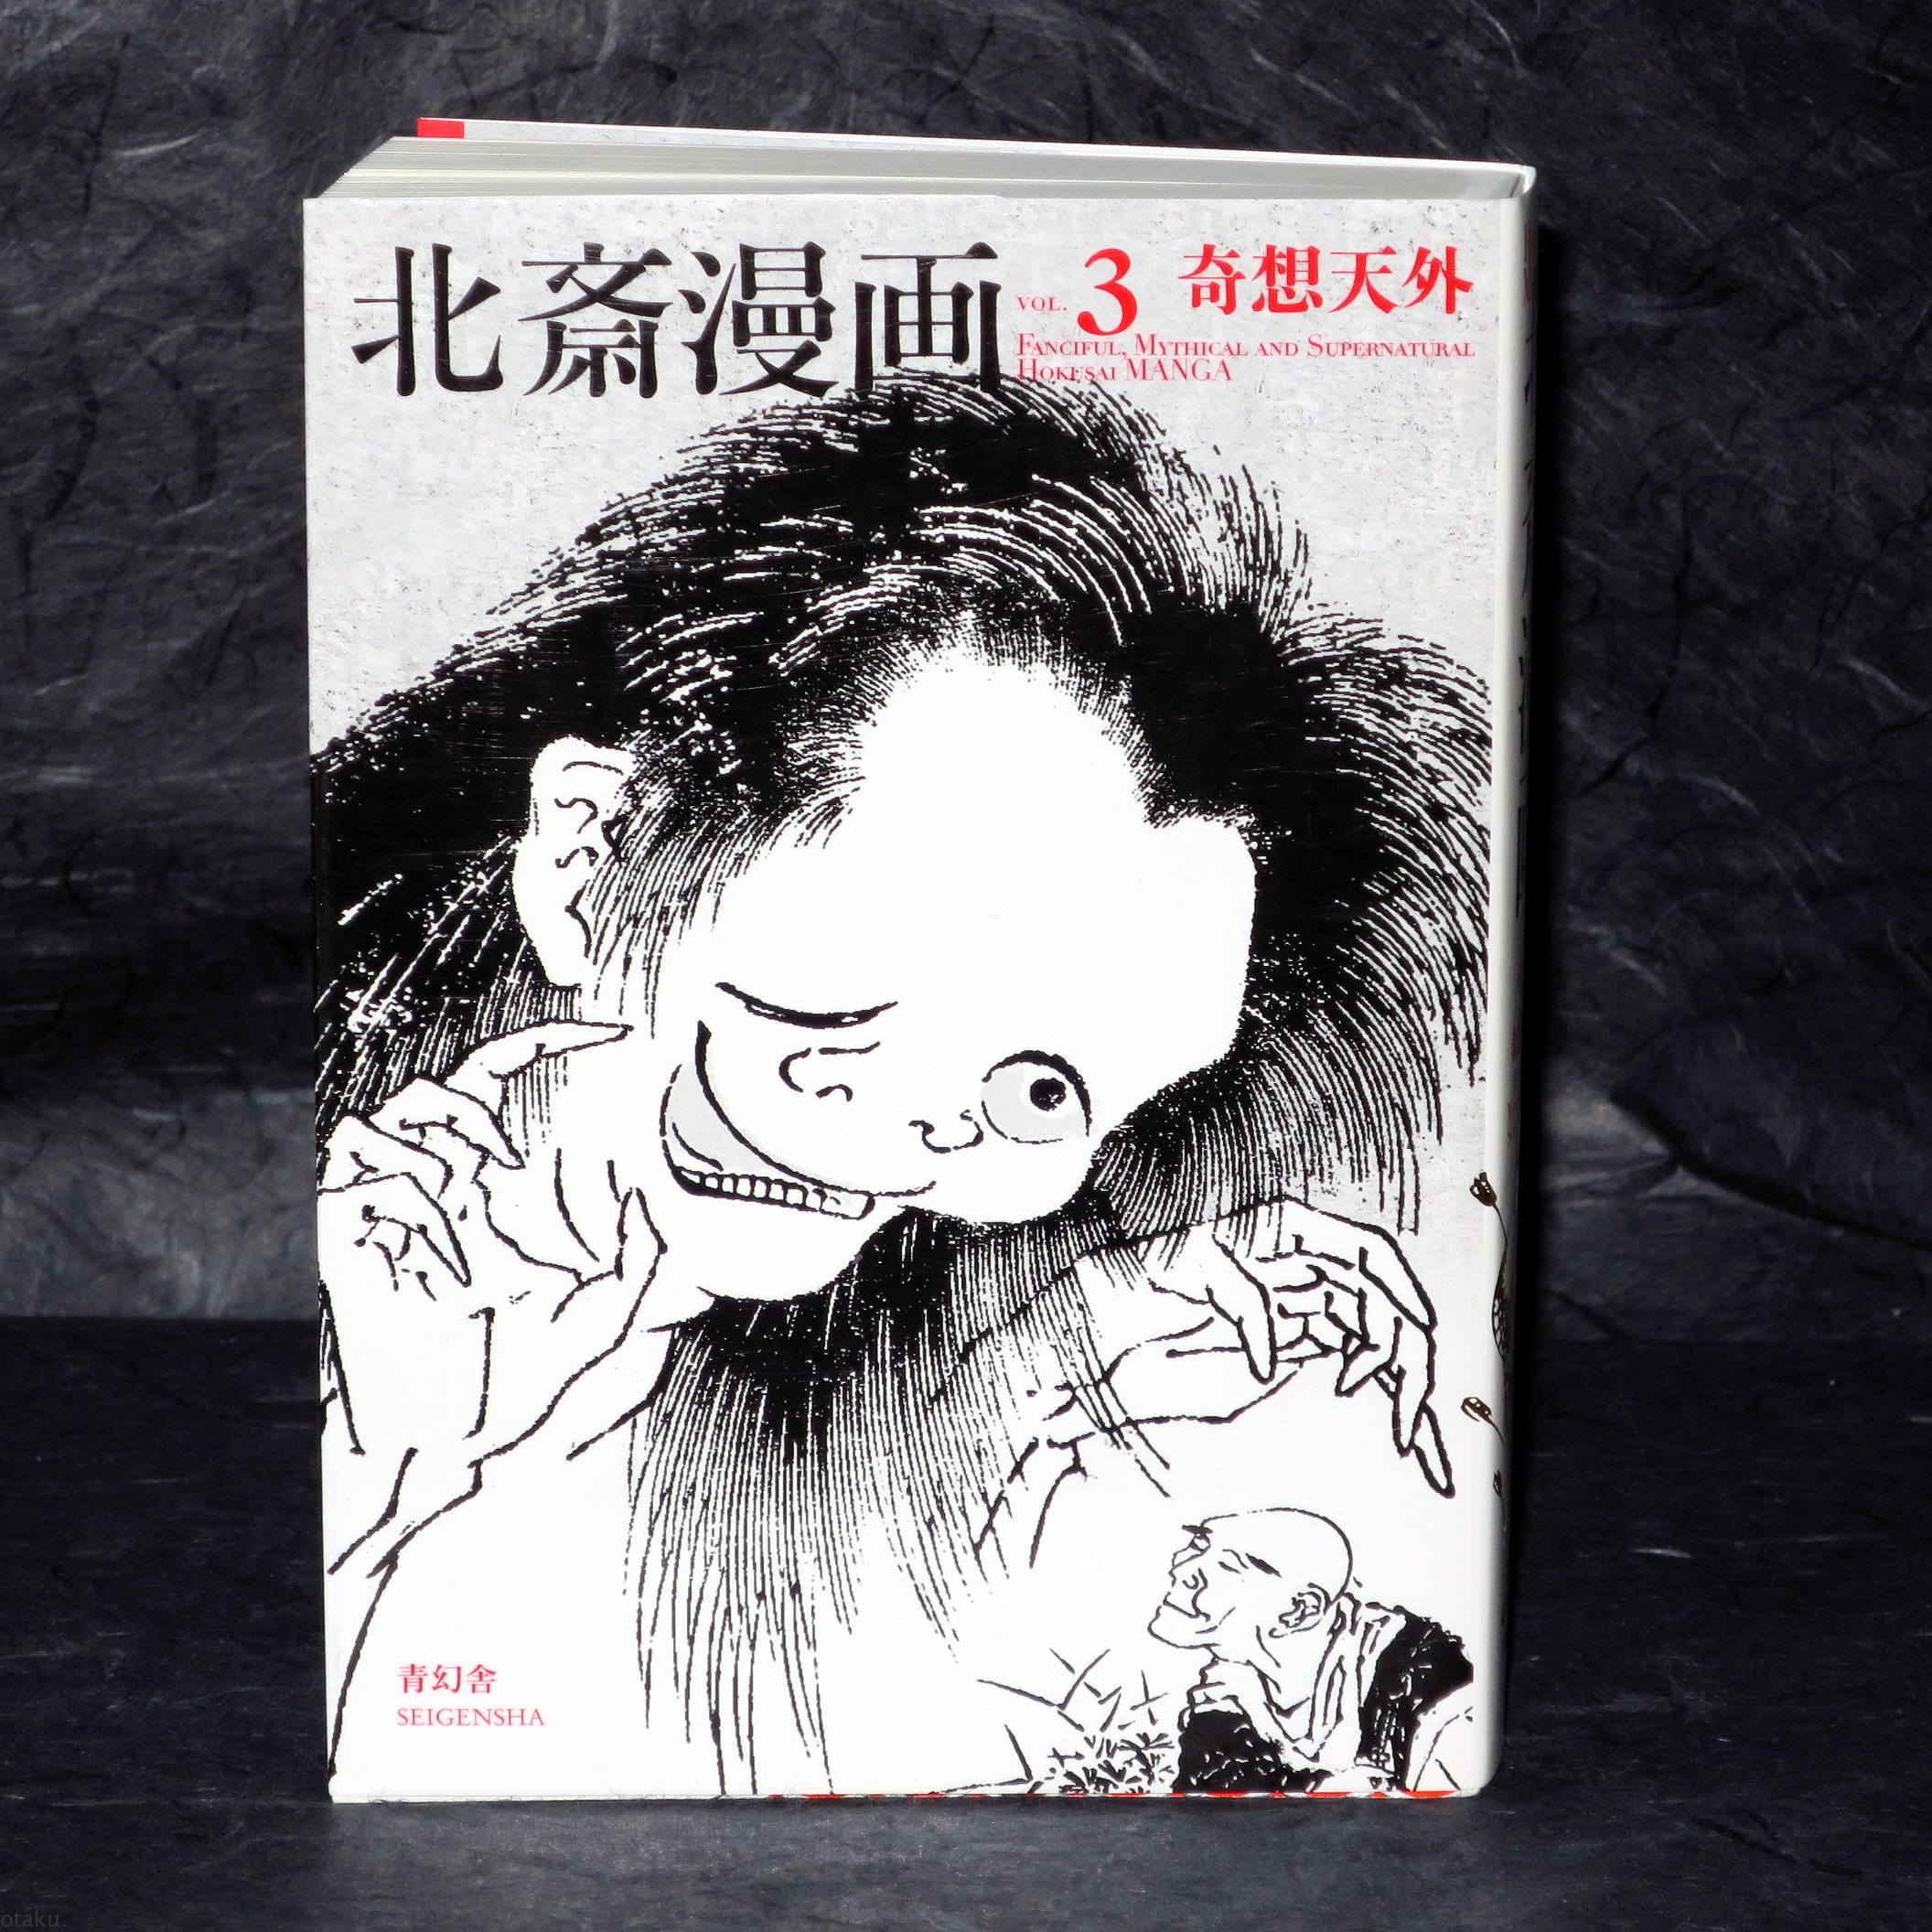 Fanciful, Mythical and Supernatural Hokusai Manga